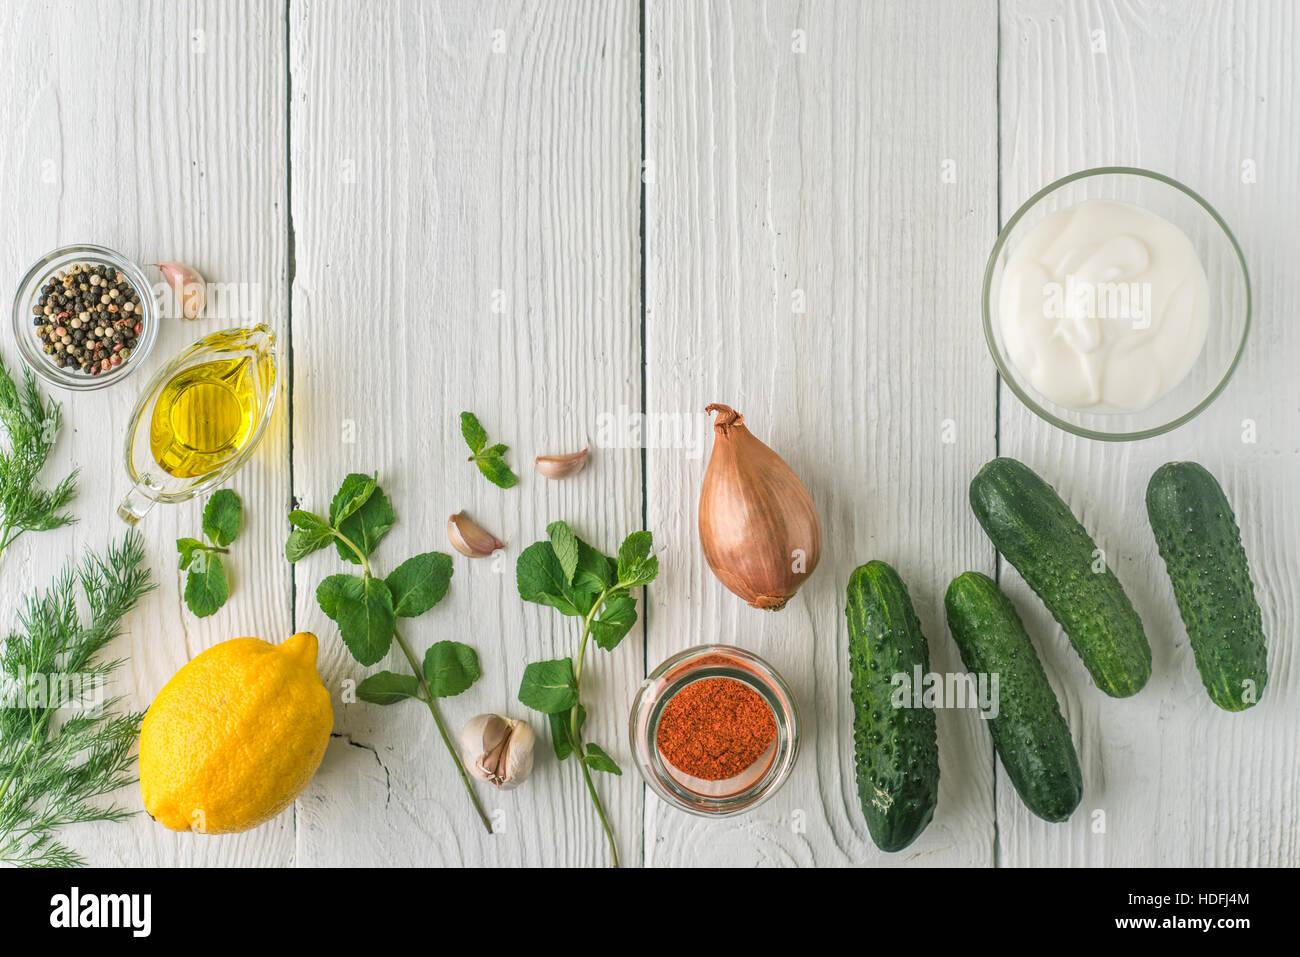 Ingredients for tzatziki on the white wooden table horizontal - Stock Image